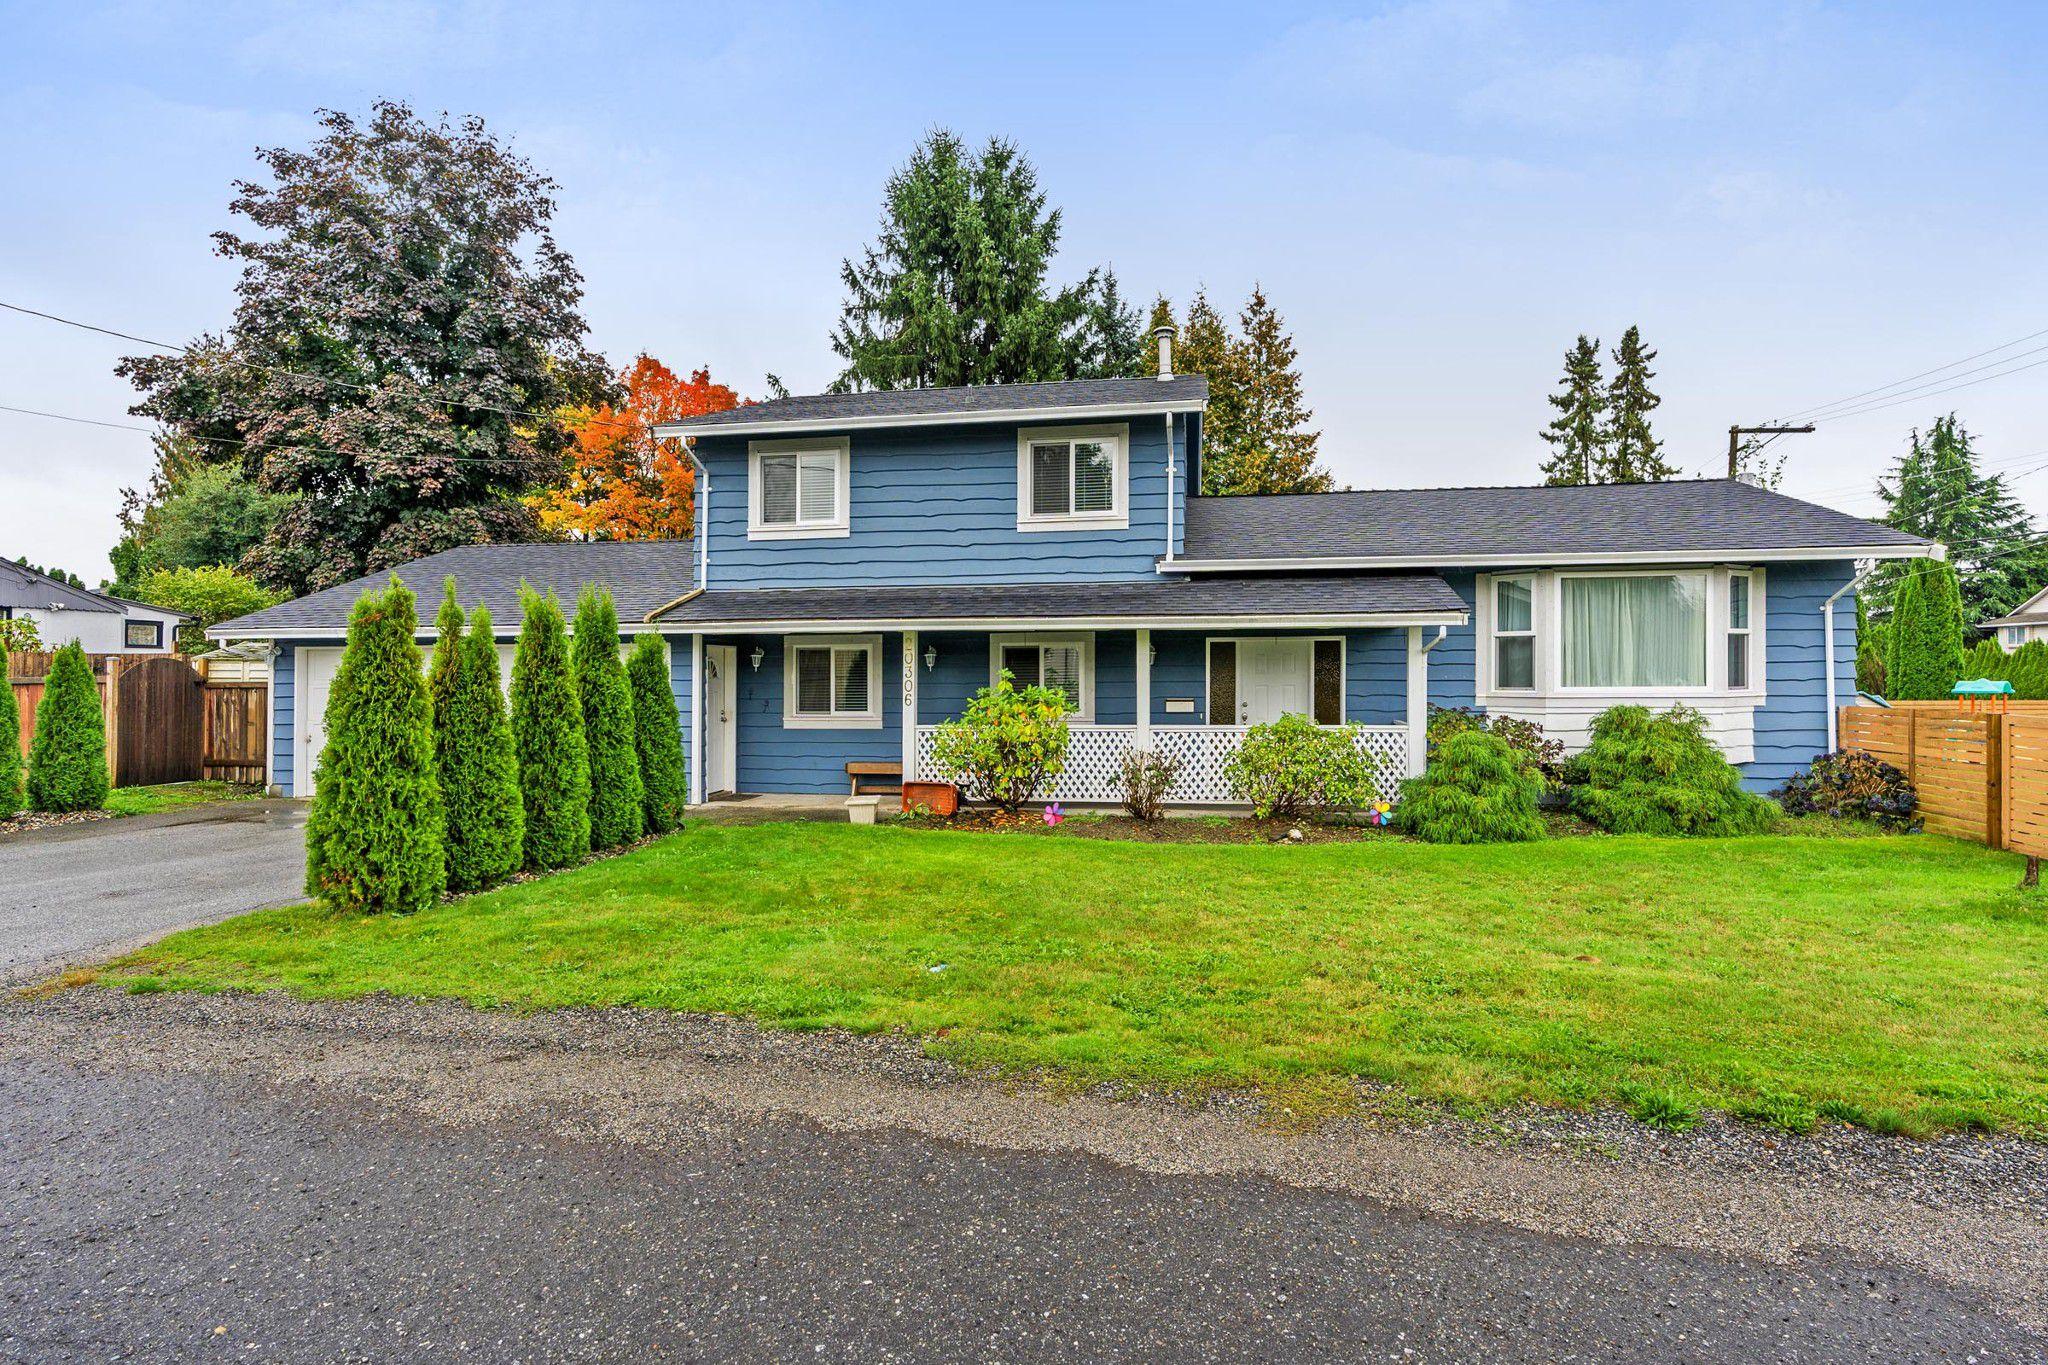 Main Photo: 20306 116 Avenue in Maple Ridge: Southwest Maple Ridge House for sale : MLS®# R2311662